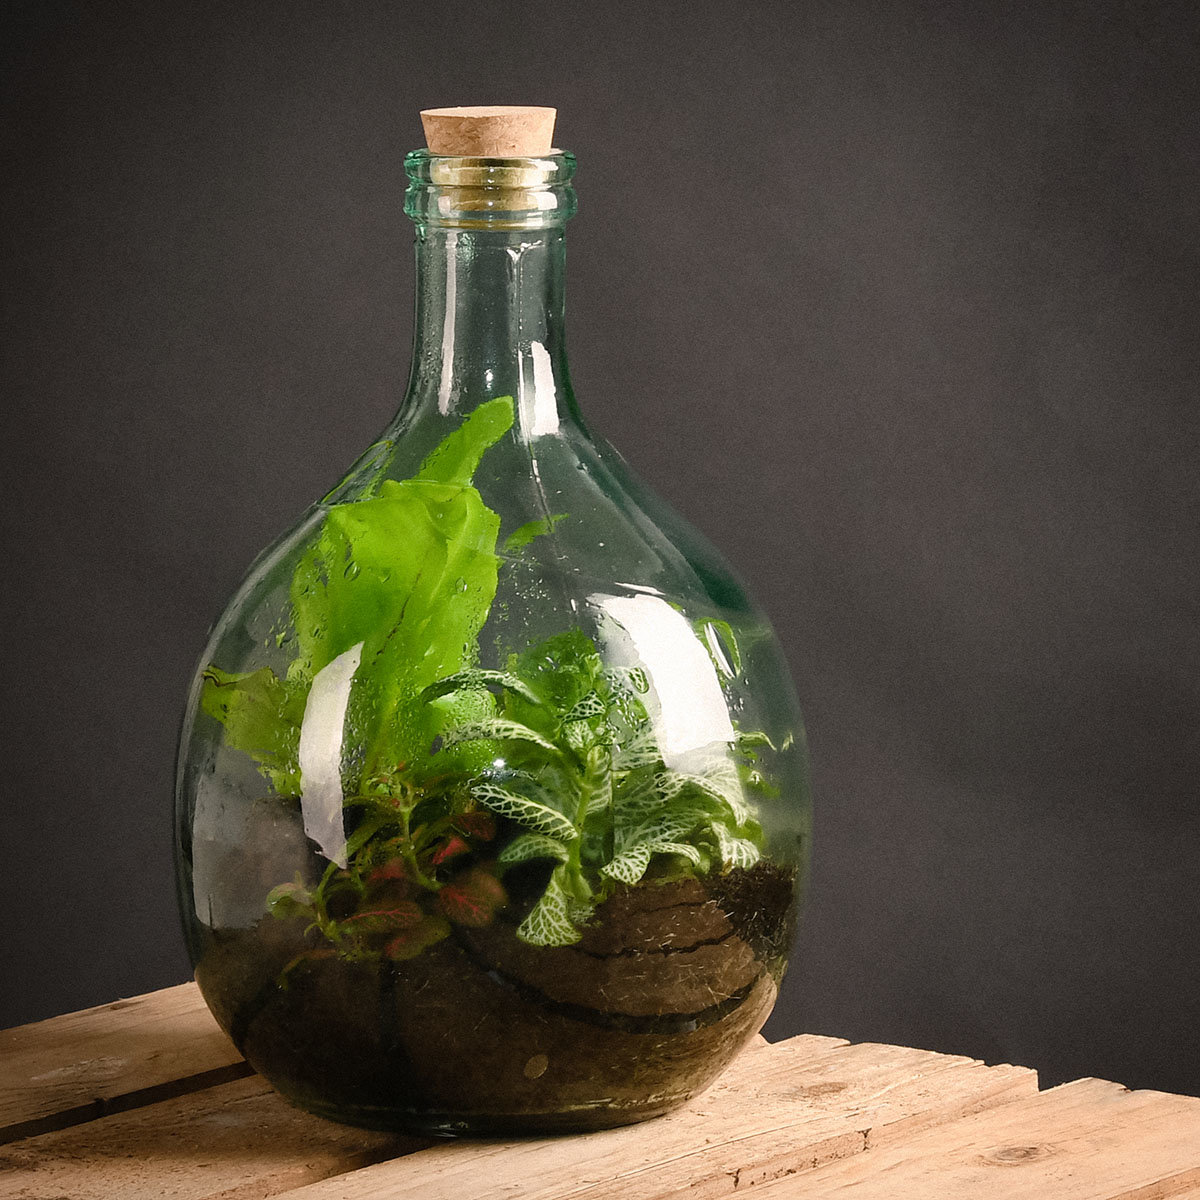 DIY Terrariumflasche Komplettset, 5 Liter | #2